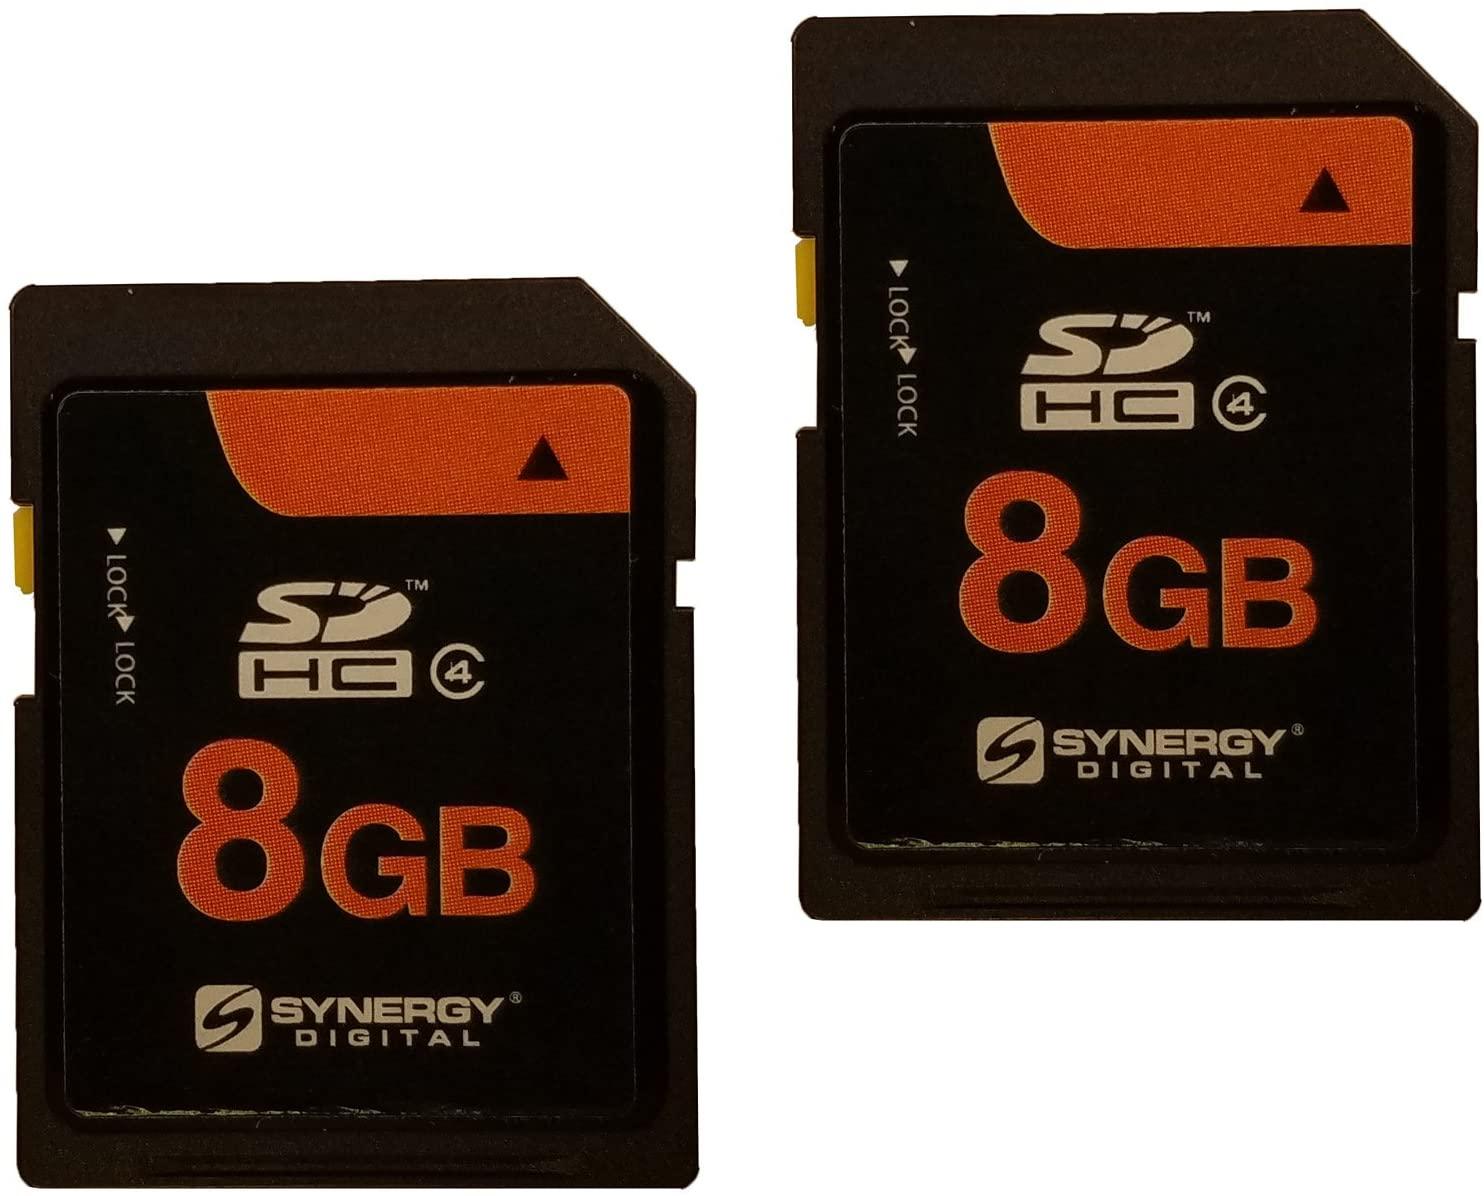 HP PhotoSmart 935 Digital Camera Memory Card 2 x 8GB Secure Digital High Capacity (SDHC) Memory Cards (2 Pack)